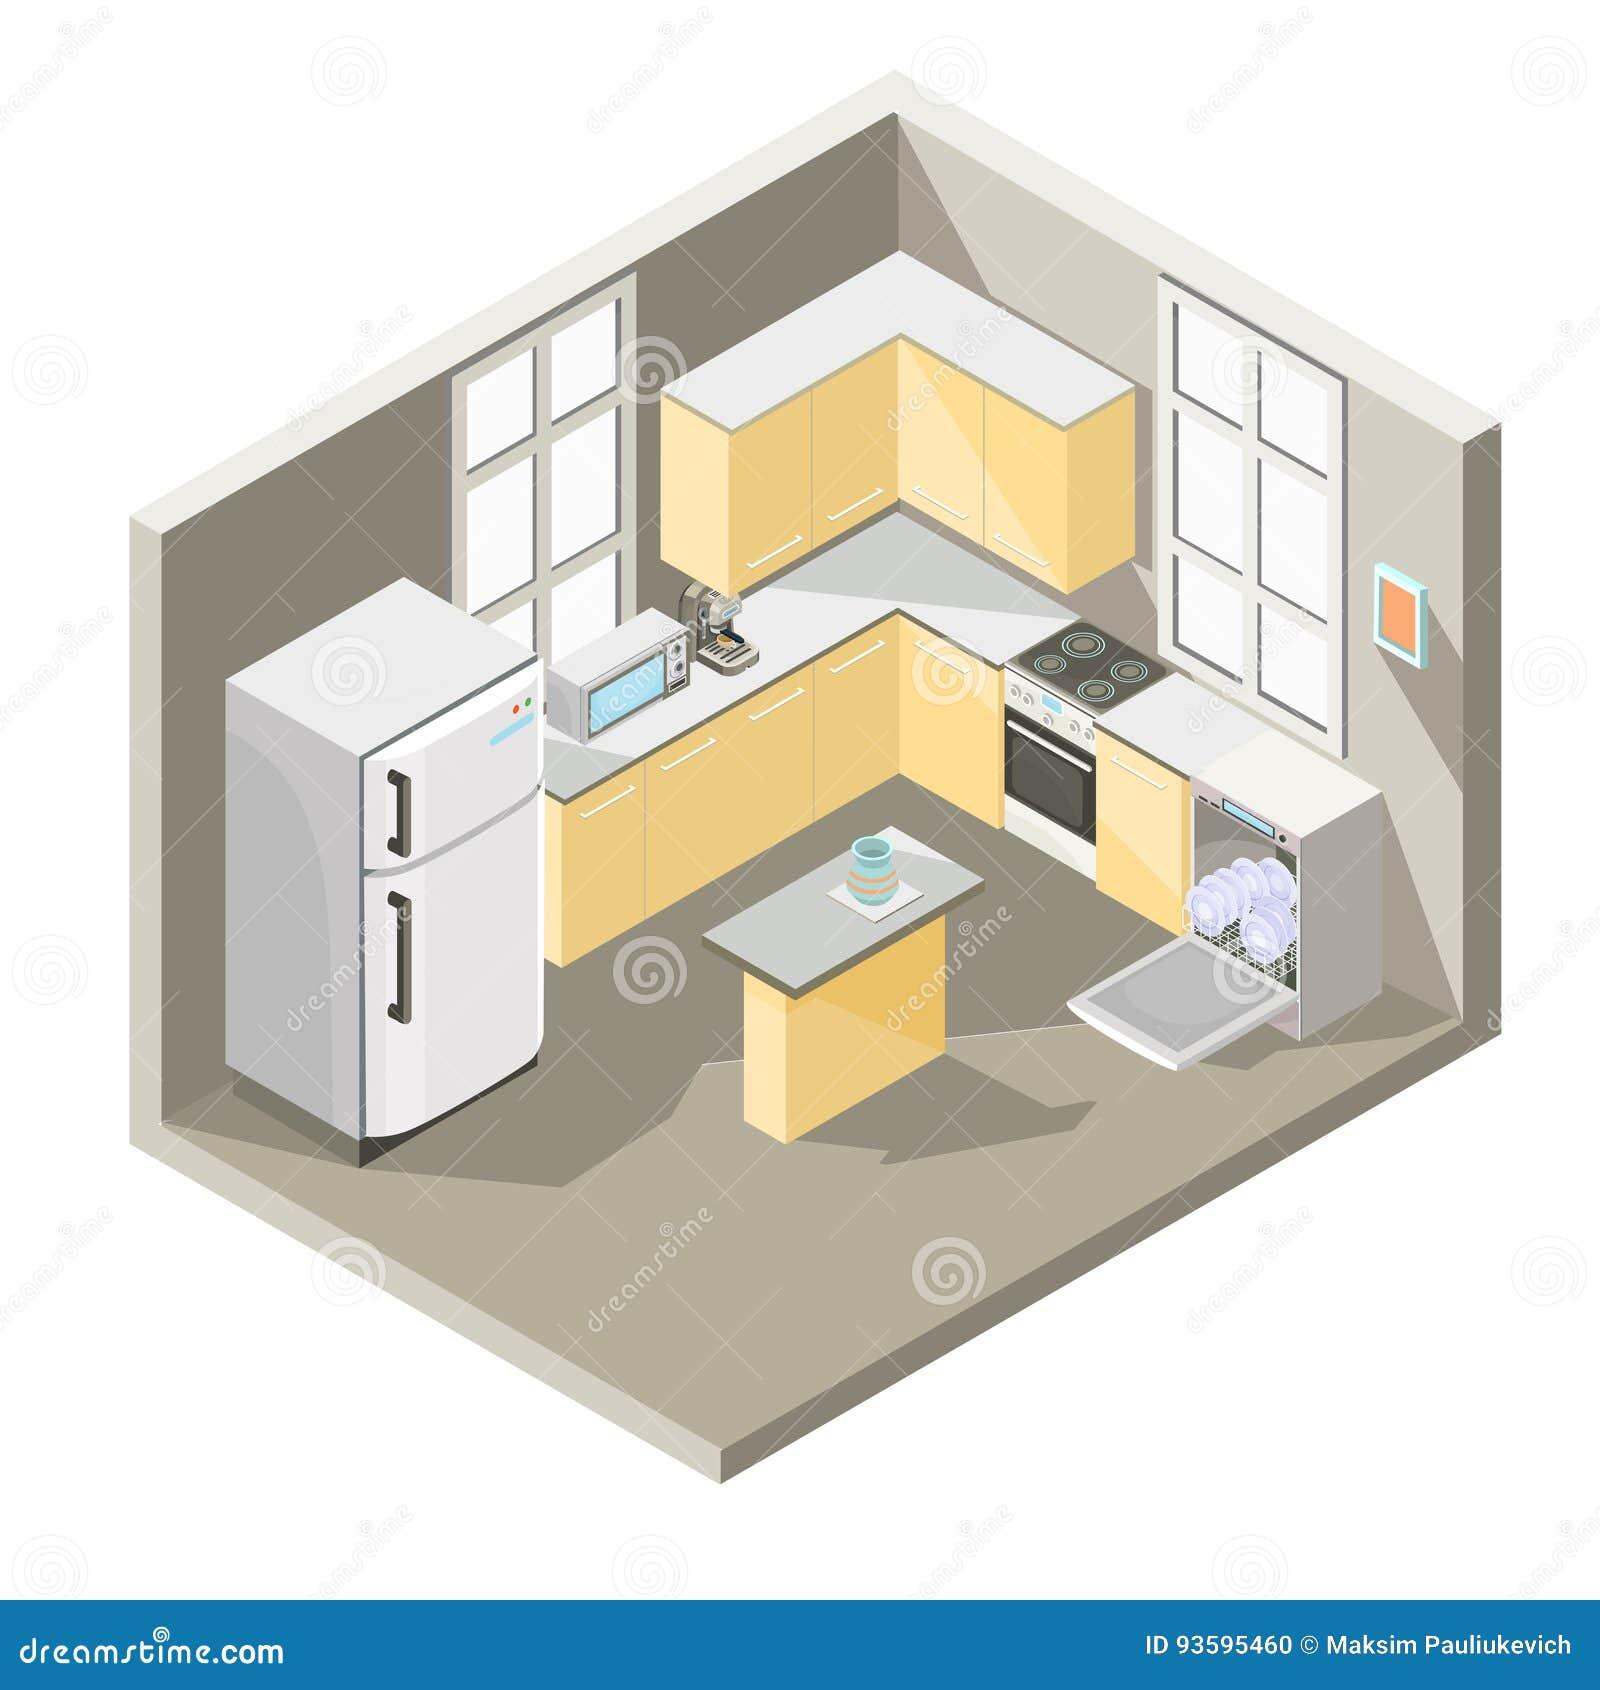 Free Online 3d Kitchen Design Tool: Isometric Design Of A Kitchen Stock Illustration